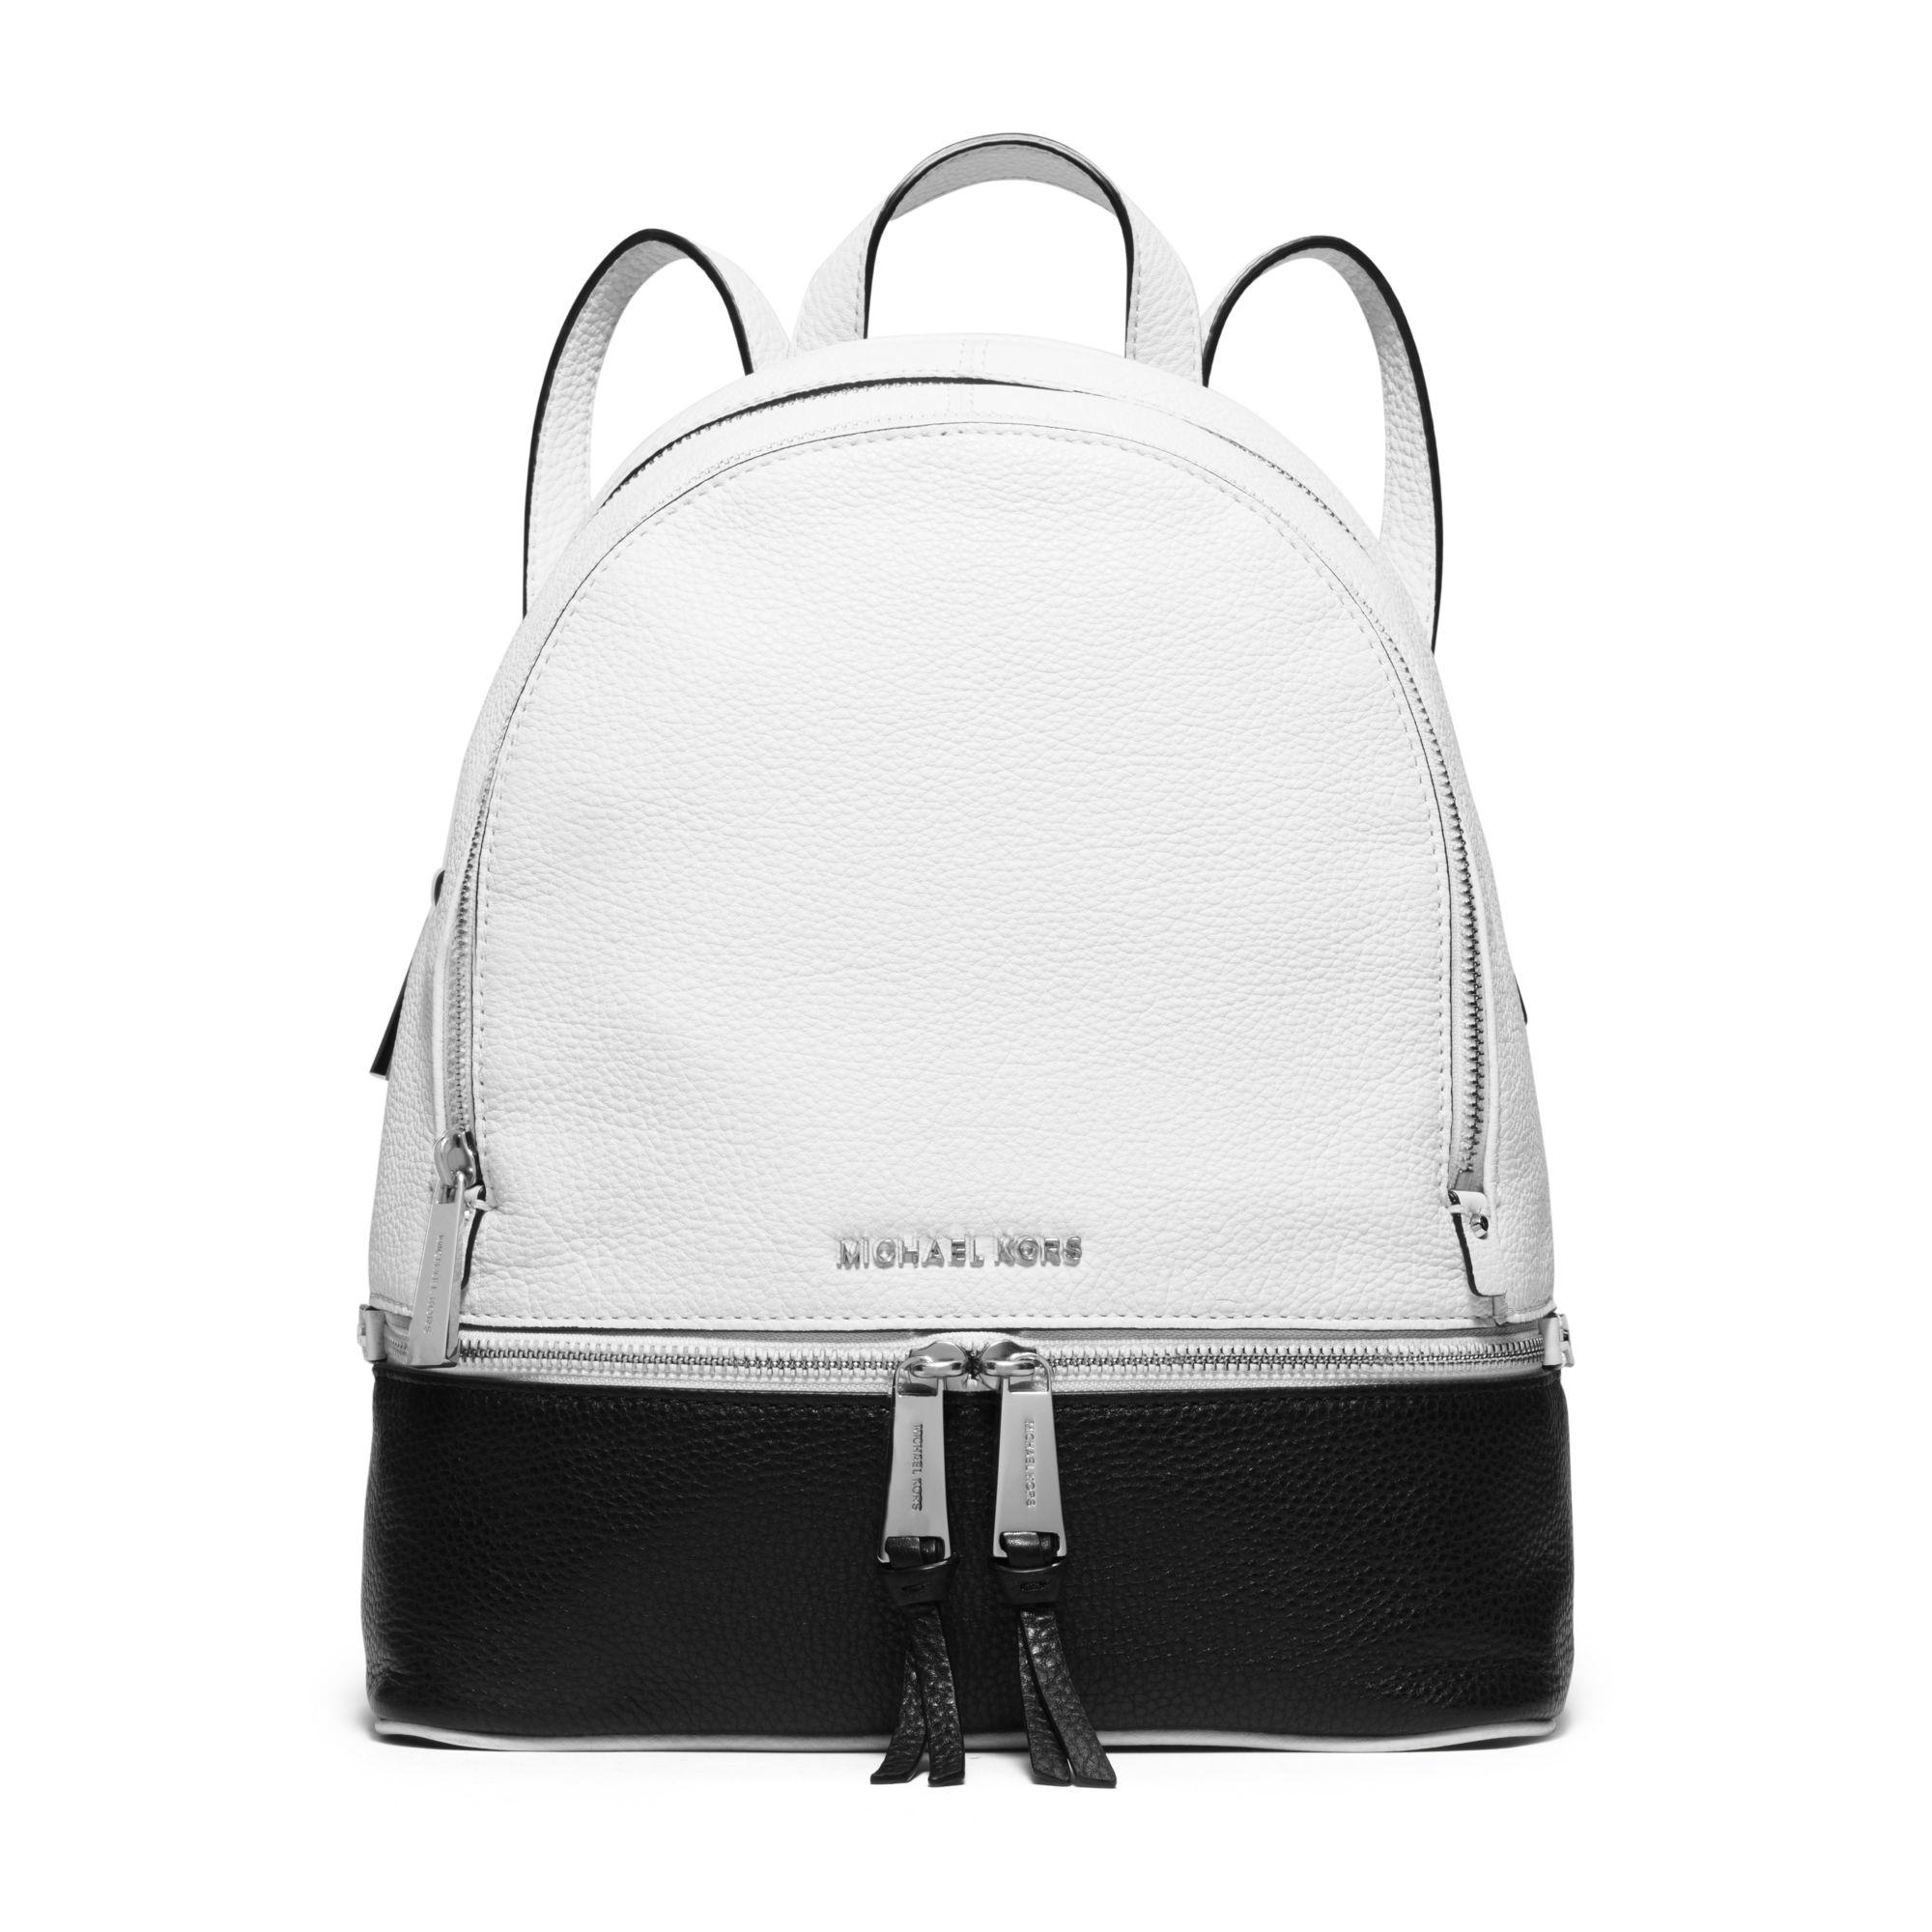 Lyst - Michael Kors Rhea Medium Color-block Leather Backpack in Black b7e28c7d5c3b3